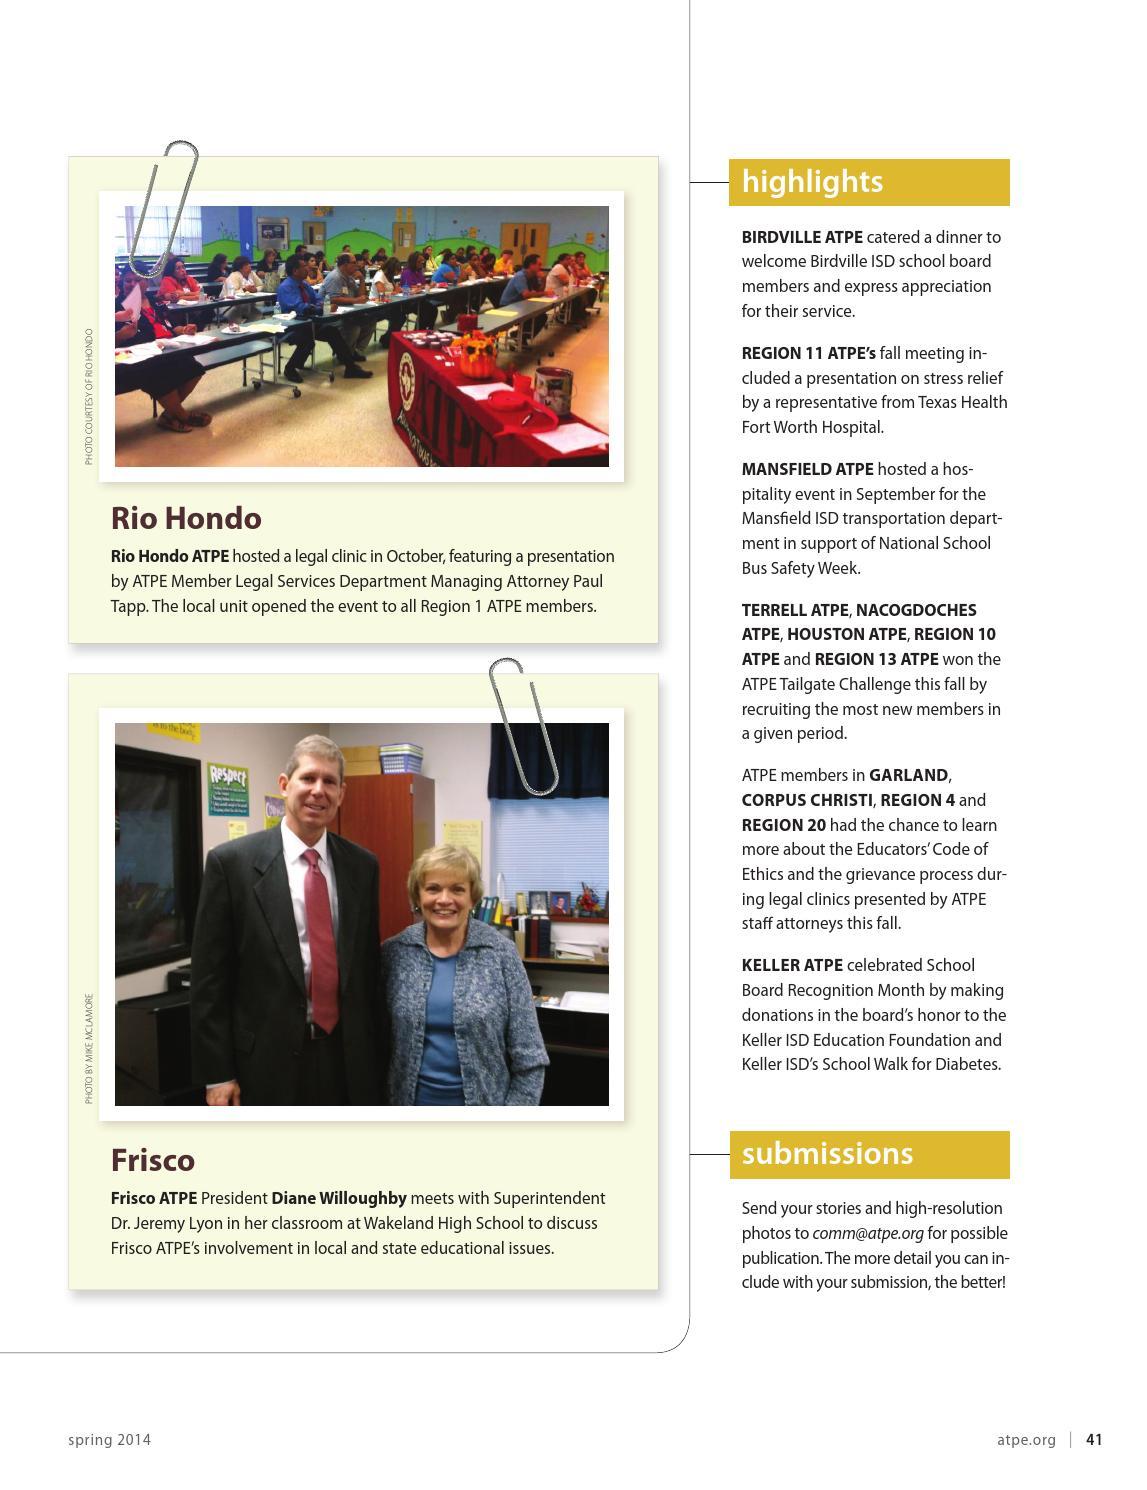 Spring 2014 Atpe News By Association Of Texas Professional Educators Issuu